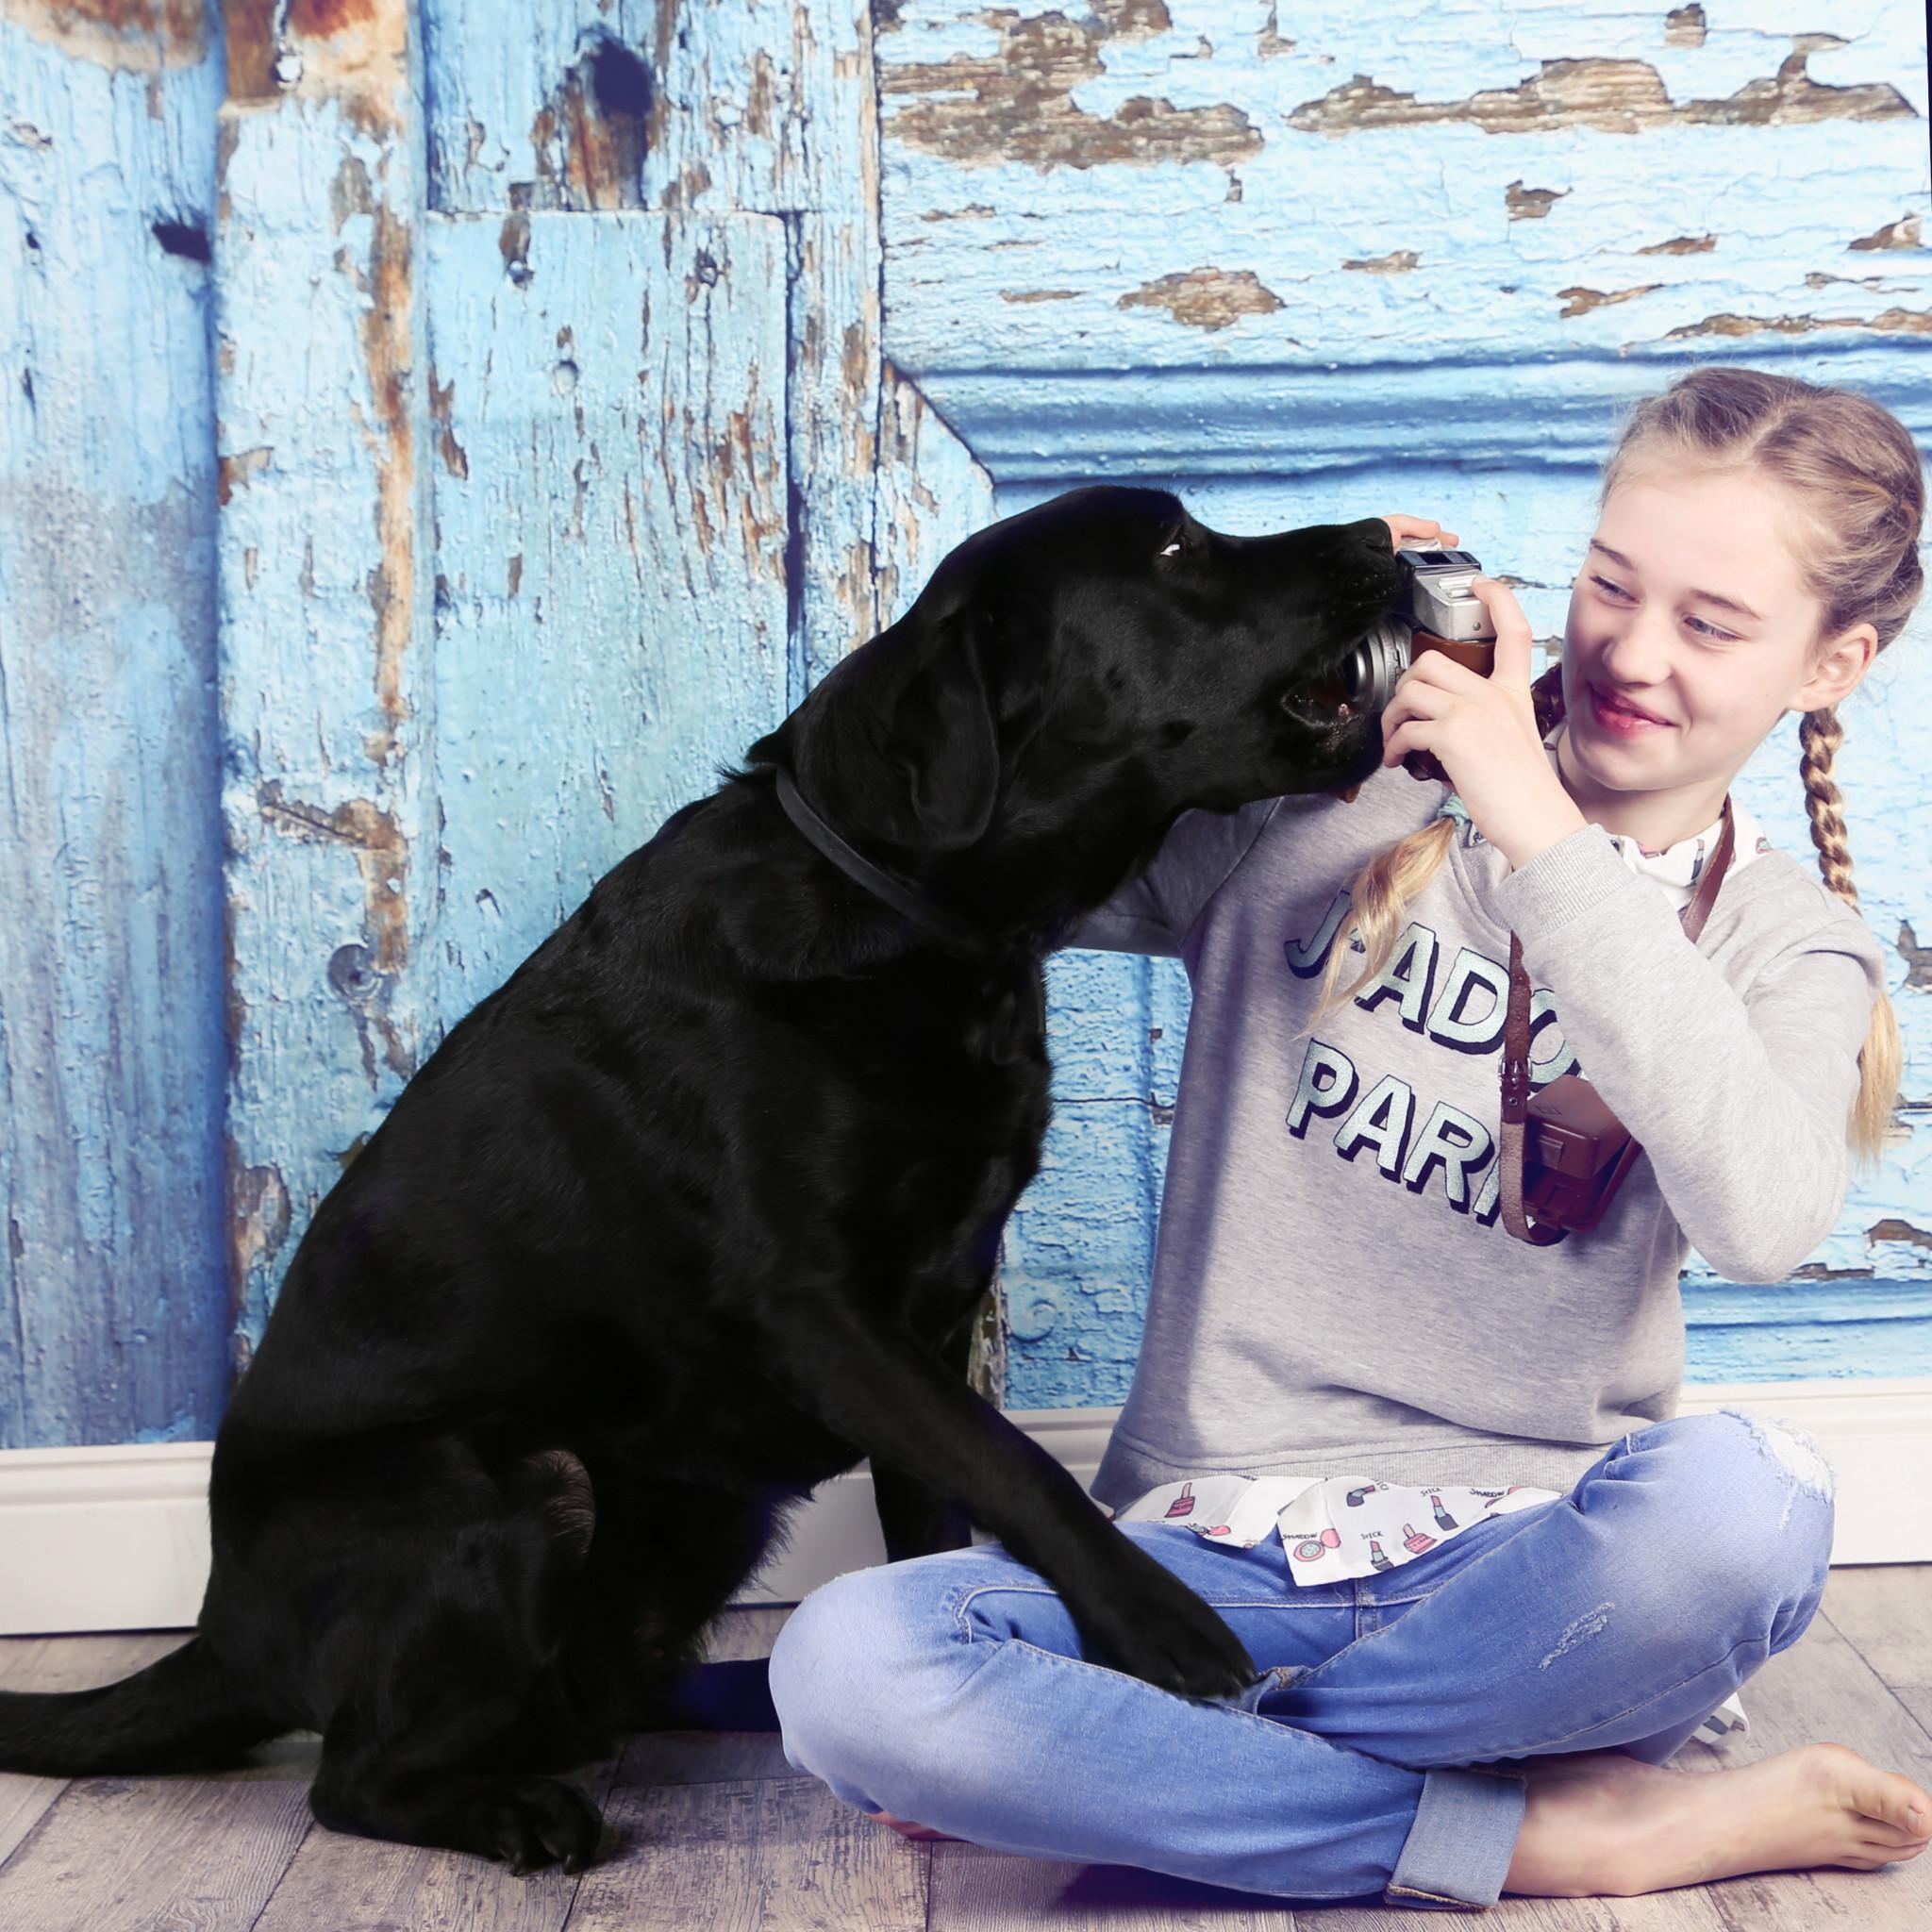 dierenfotografie - Suus' Fotosjop